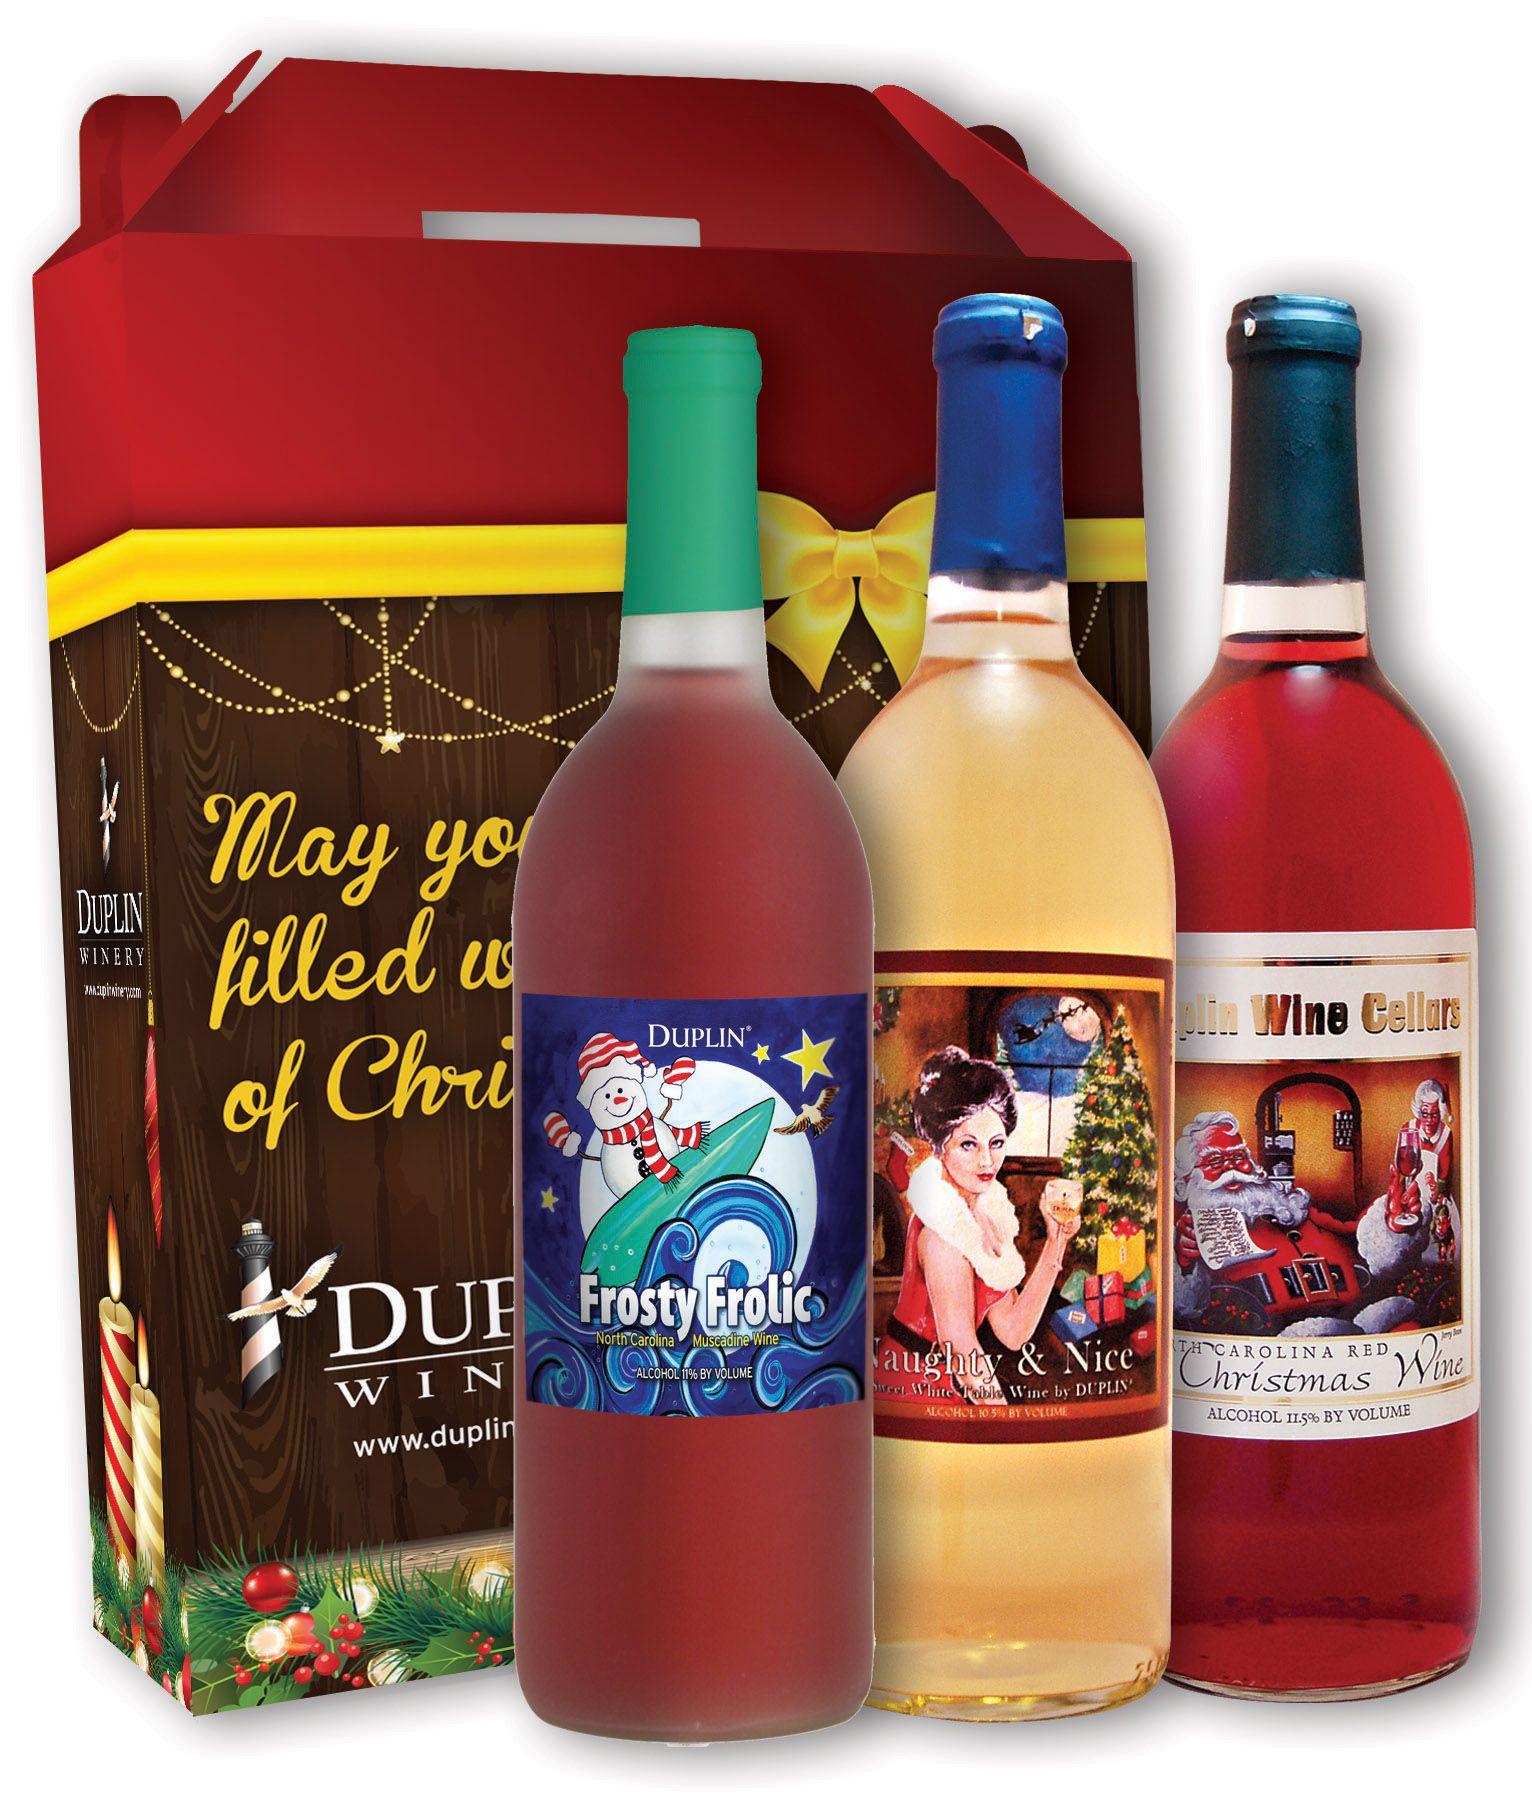 Duplin Winery Christmas Gift Set 2014 Christmas Gift Sets Muscadine Wine Gift Set